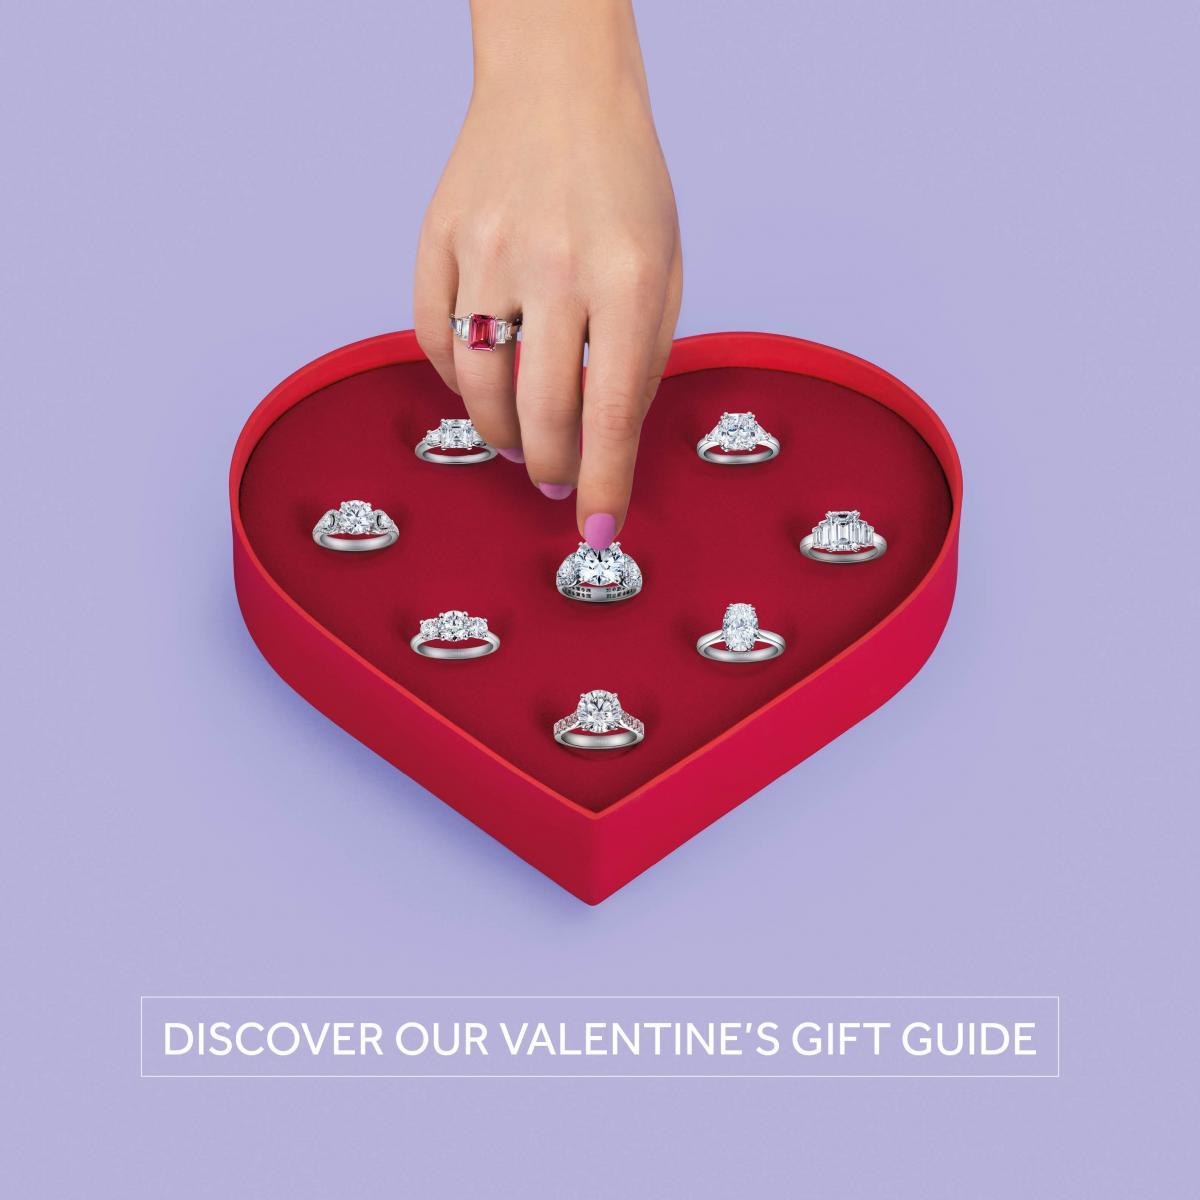 Valentine's Gift Guide